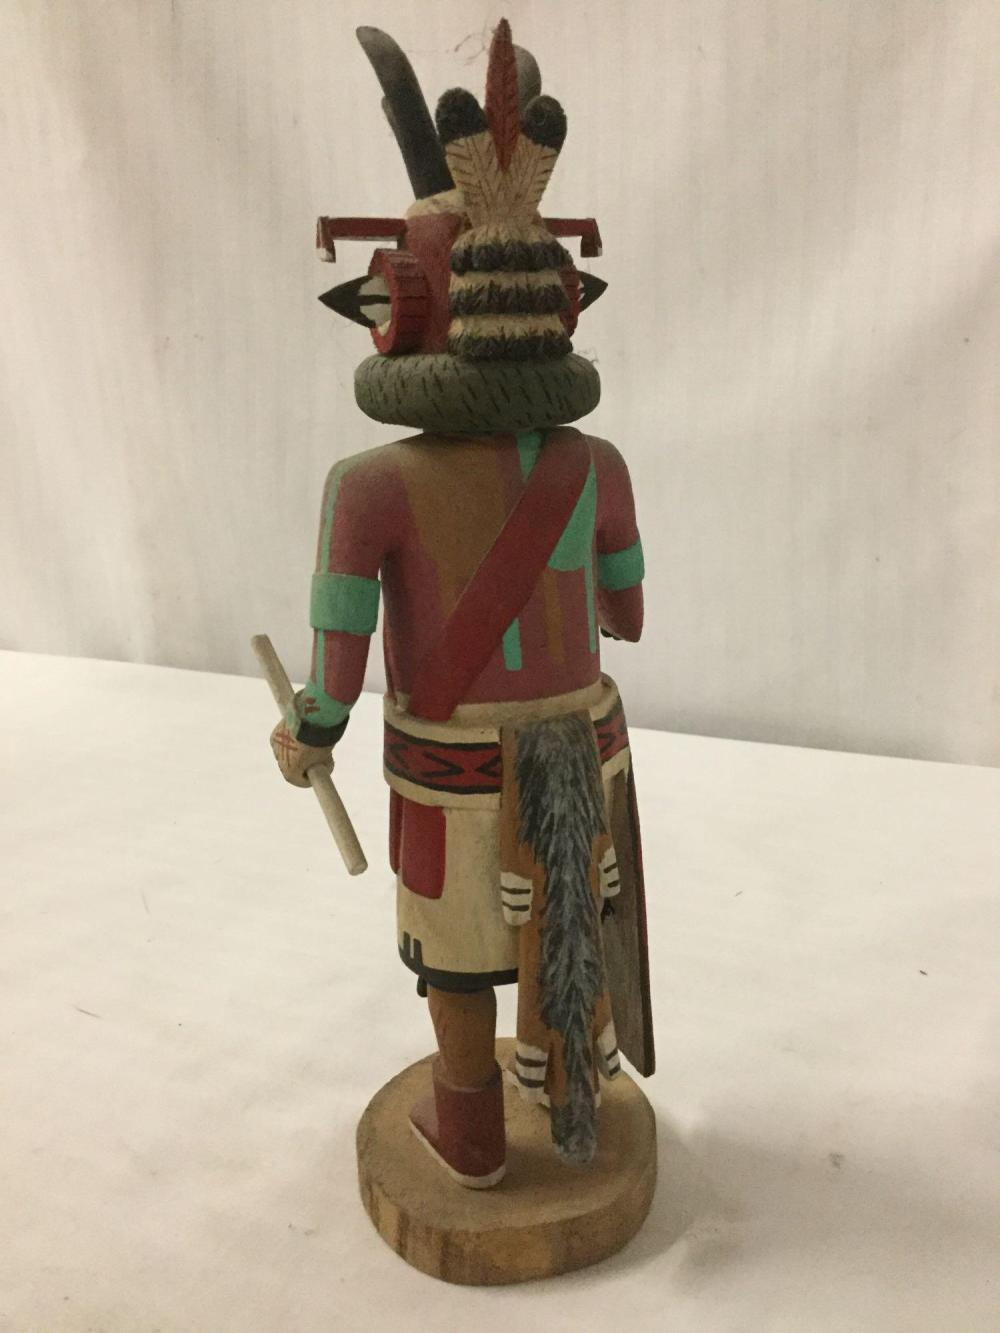 Lot 117: 3 Native American Hopi Kachina dolls - 2x signed - Antelope by Conrad Torivio, Rainbow by Vina